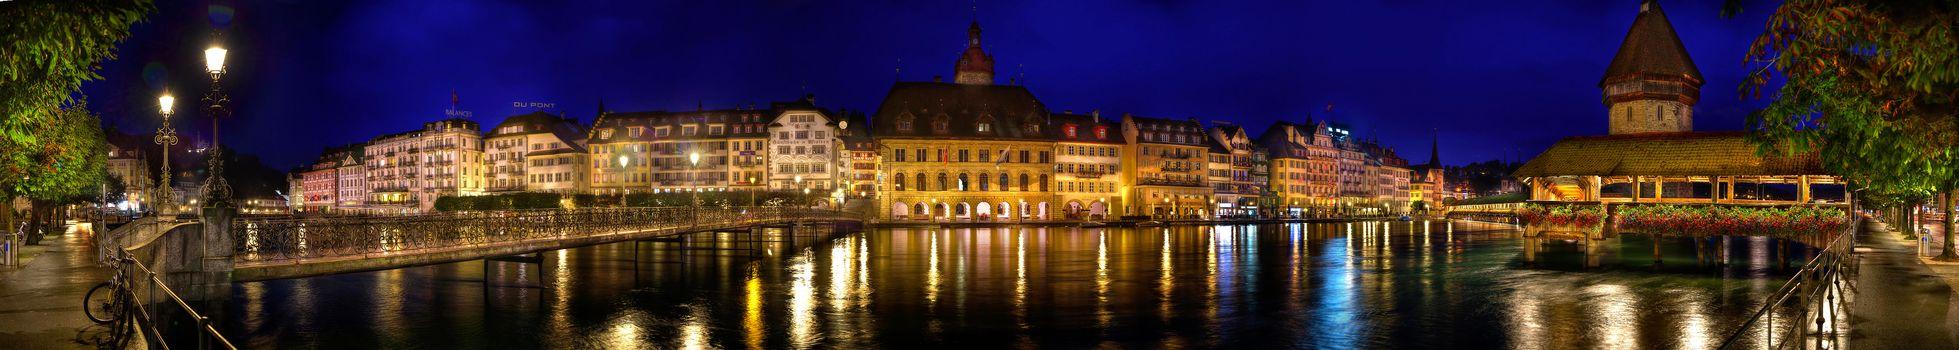 Бесплатные фото Lucerne,Switzerland,Люцерн,Швейцария,панорама